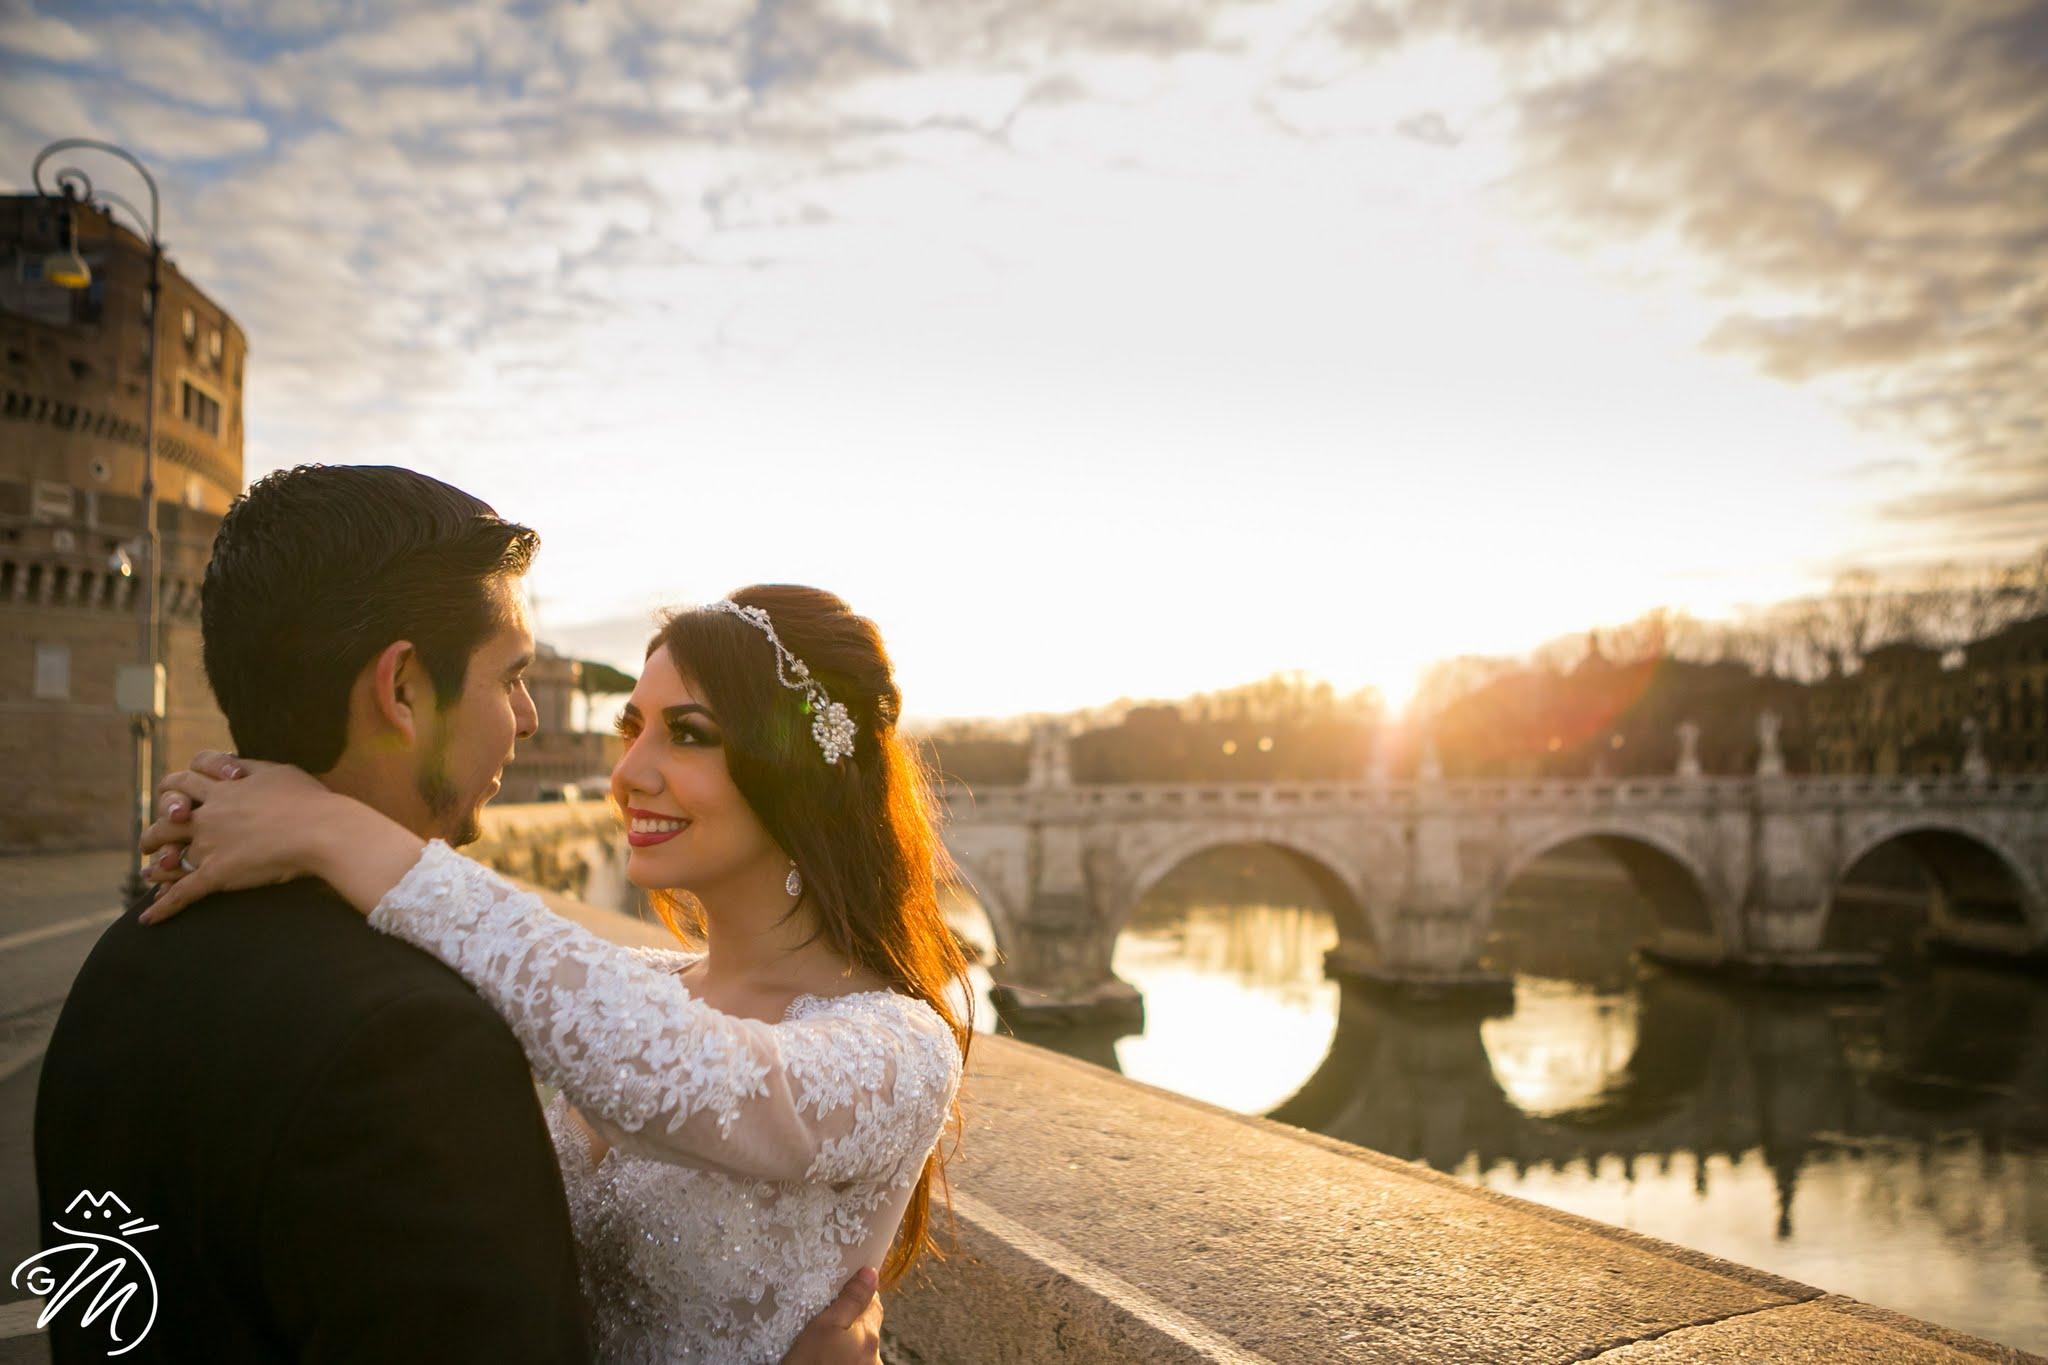 fotografo matrimonio Roma photographer in Italy ORIZZONTALI2_LOGO_HOME_PAGE_INTERNATIONAL_PHOTOGRAPHER_IN_ROME_WEDDING_DESTINATION_GIROLAMO_MONTELEONE_-17